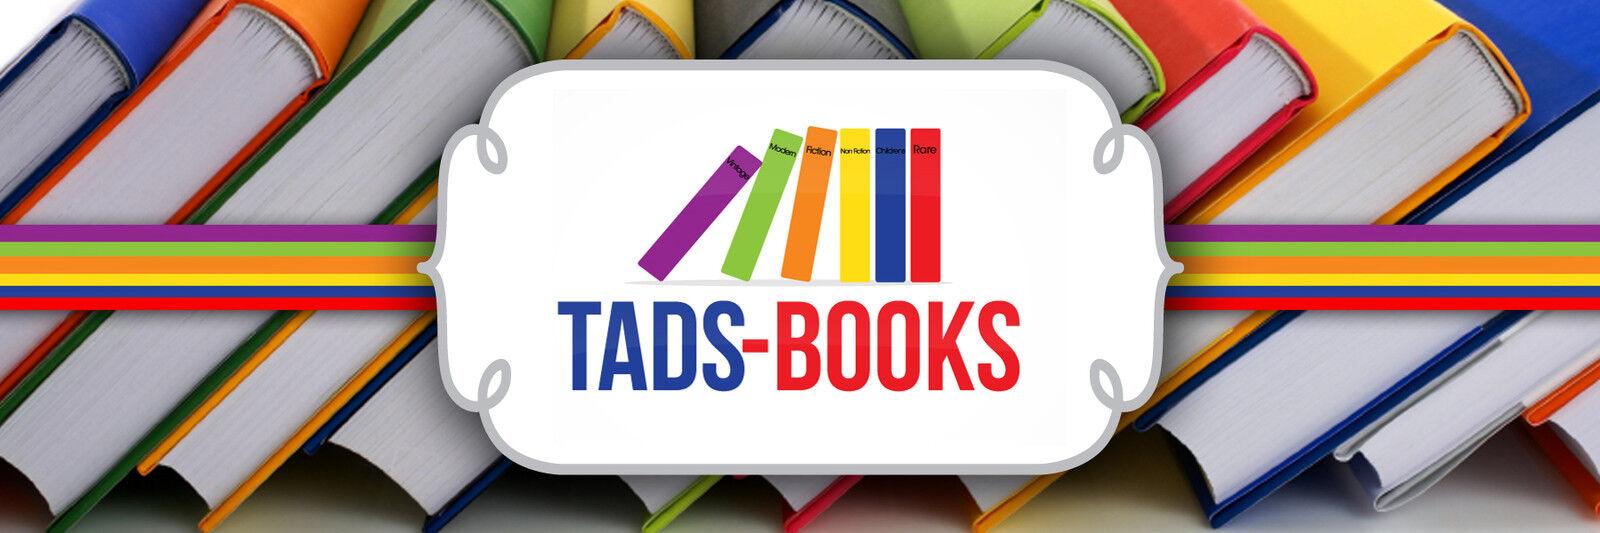 Tads-books